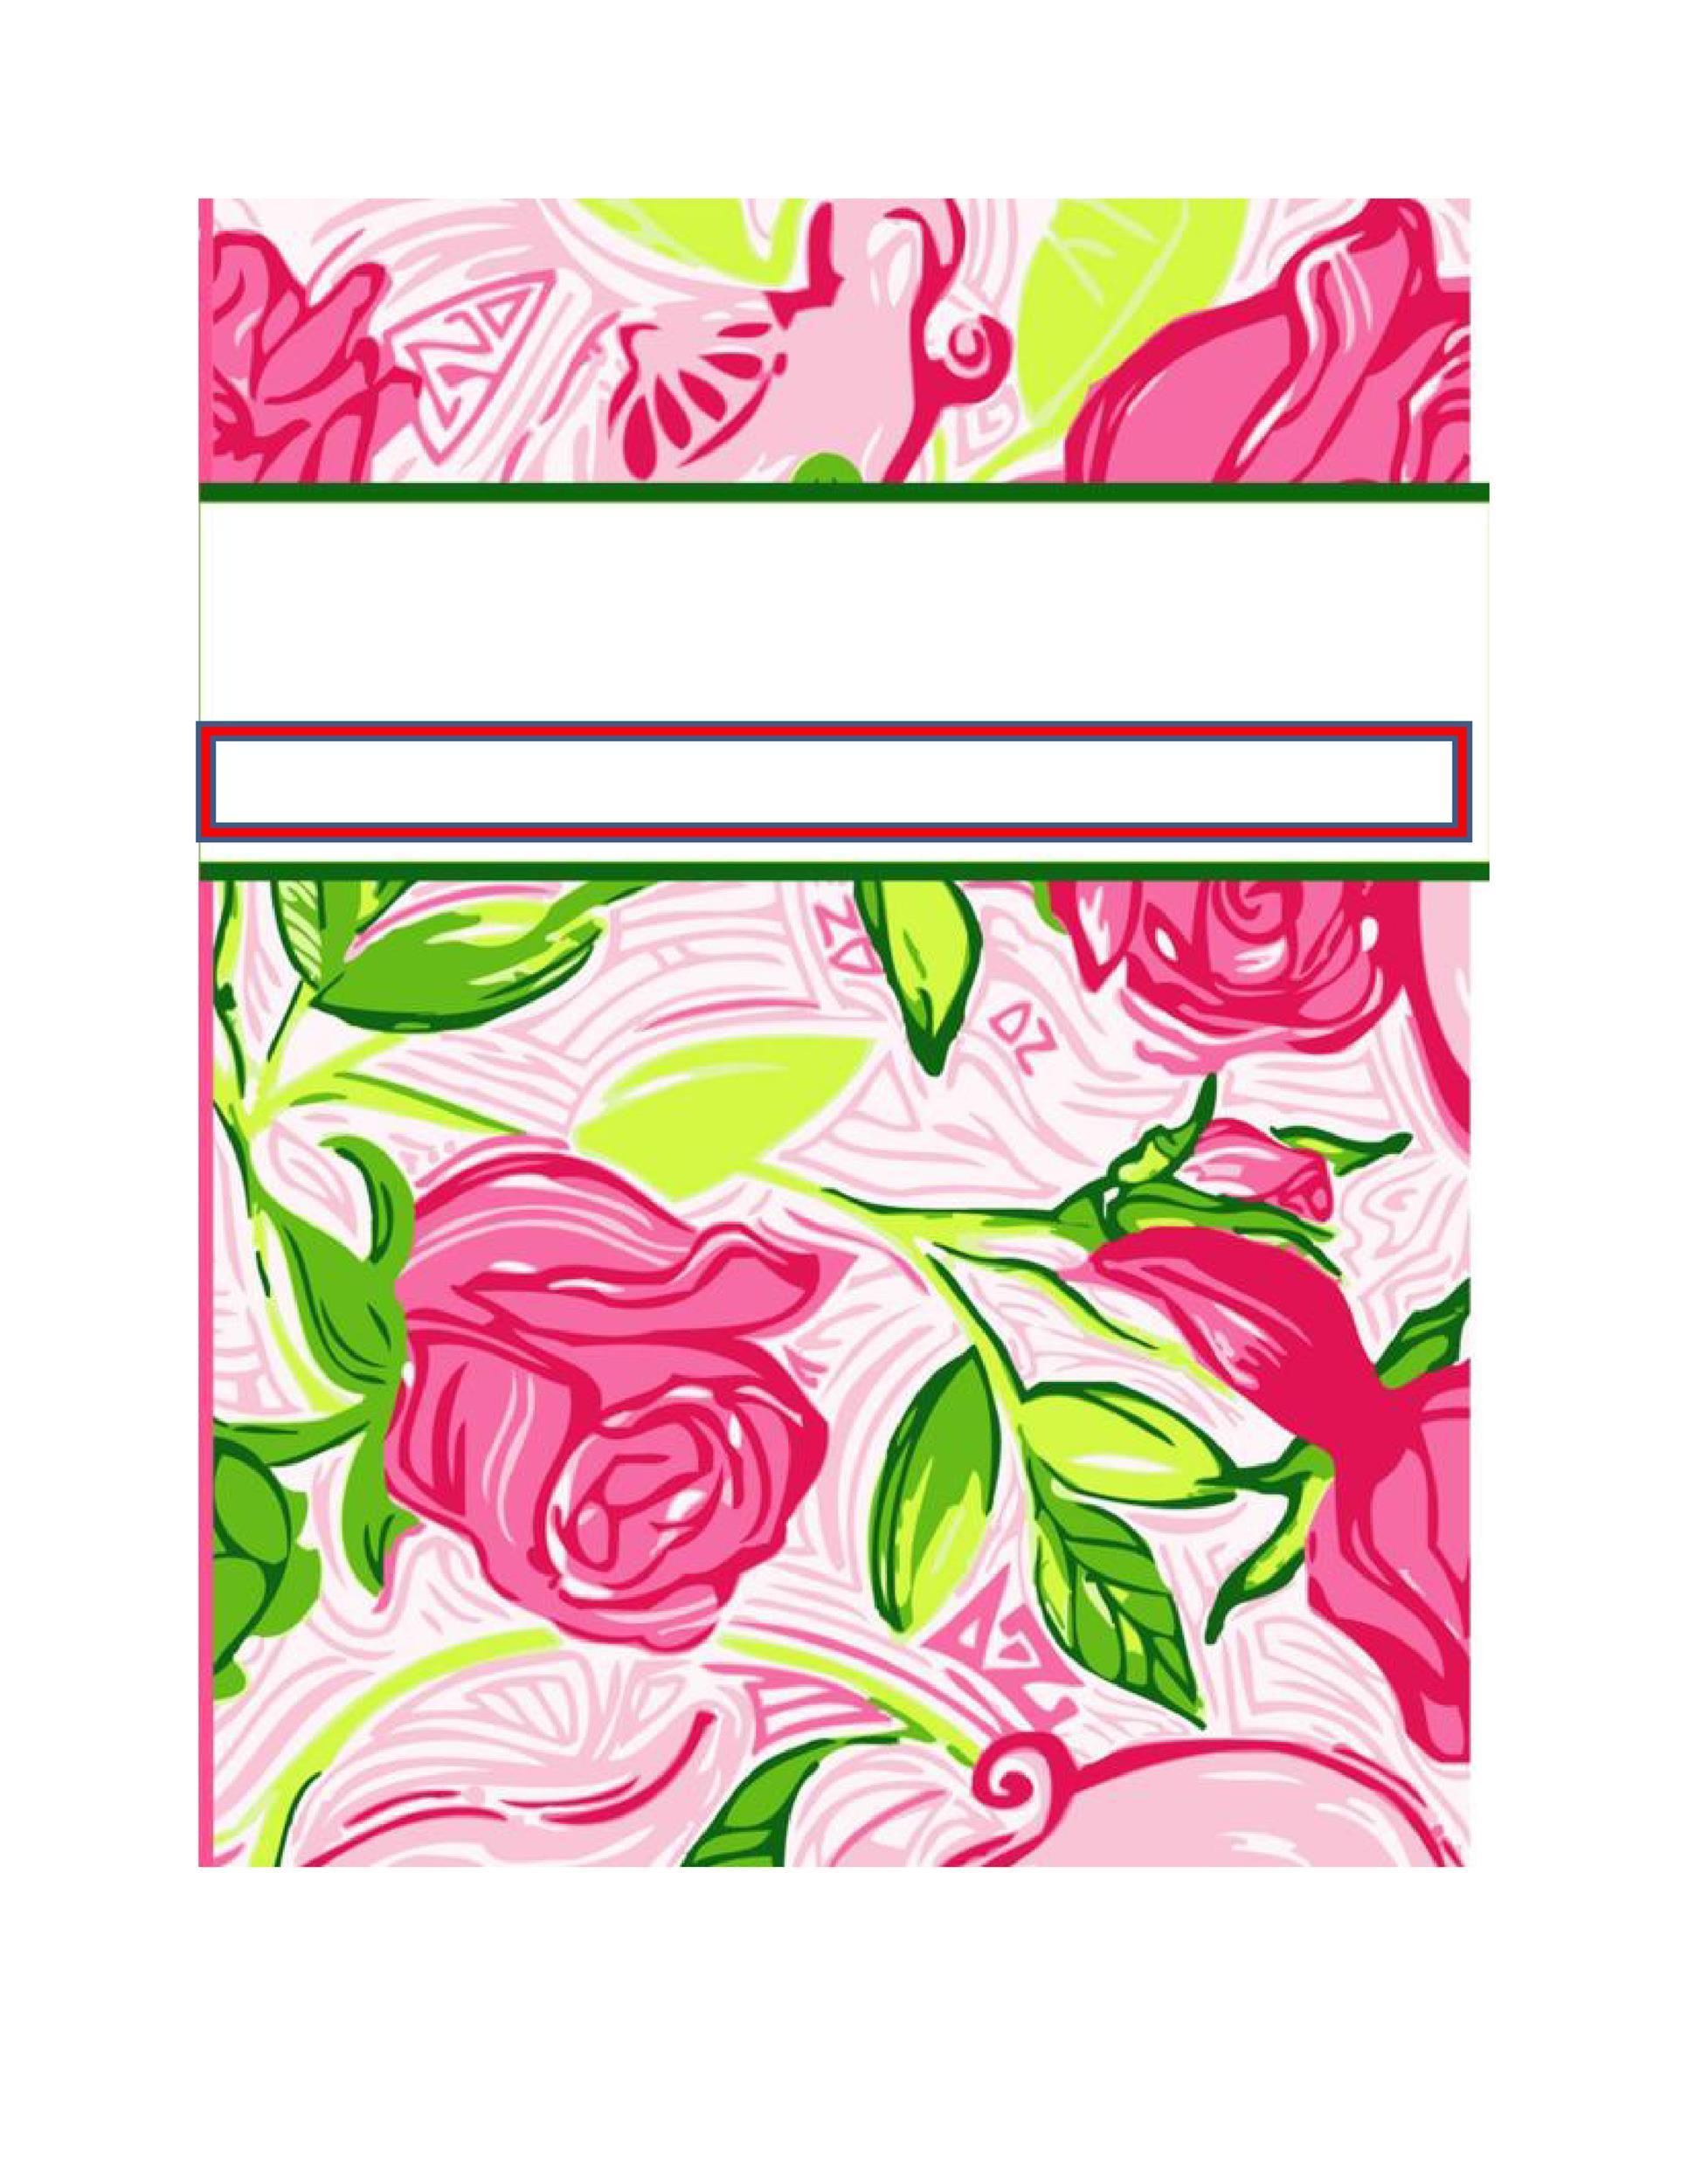 35 Beautifull Binder Cover Templates ᐅ Template Lab